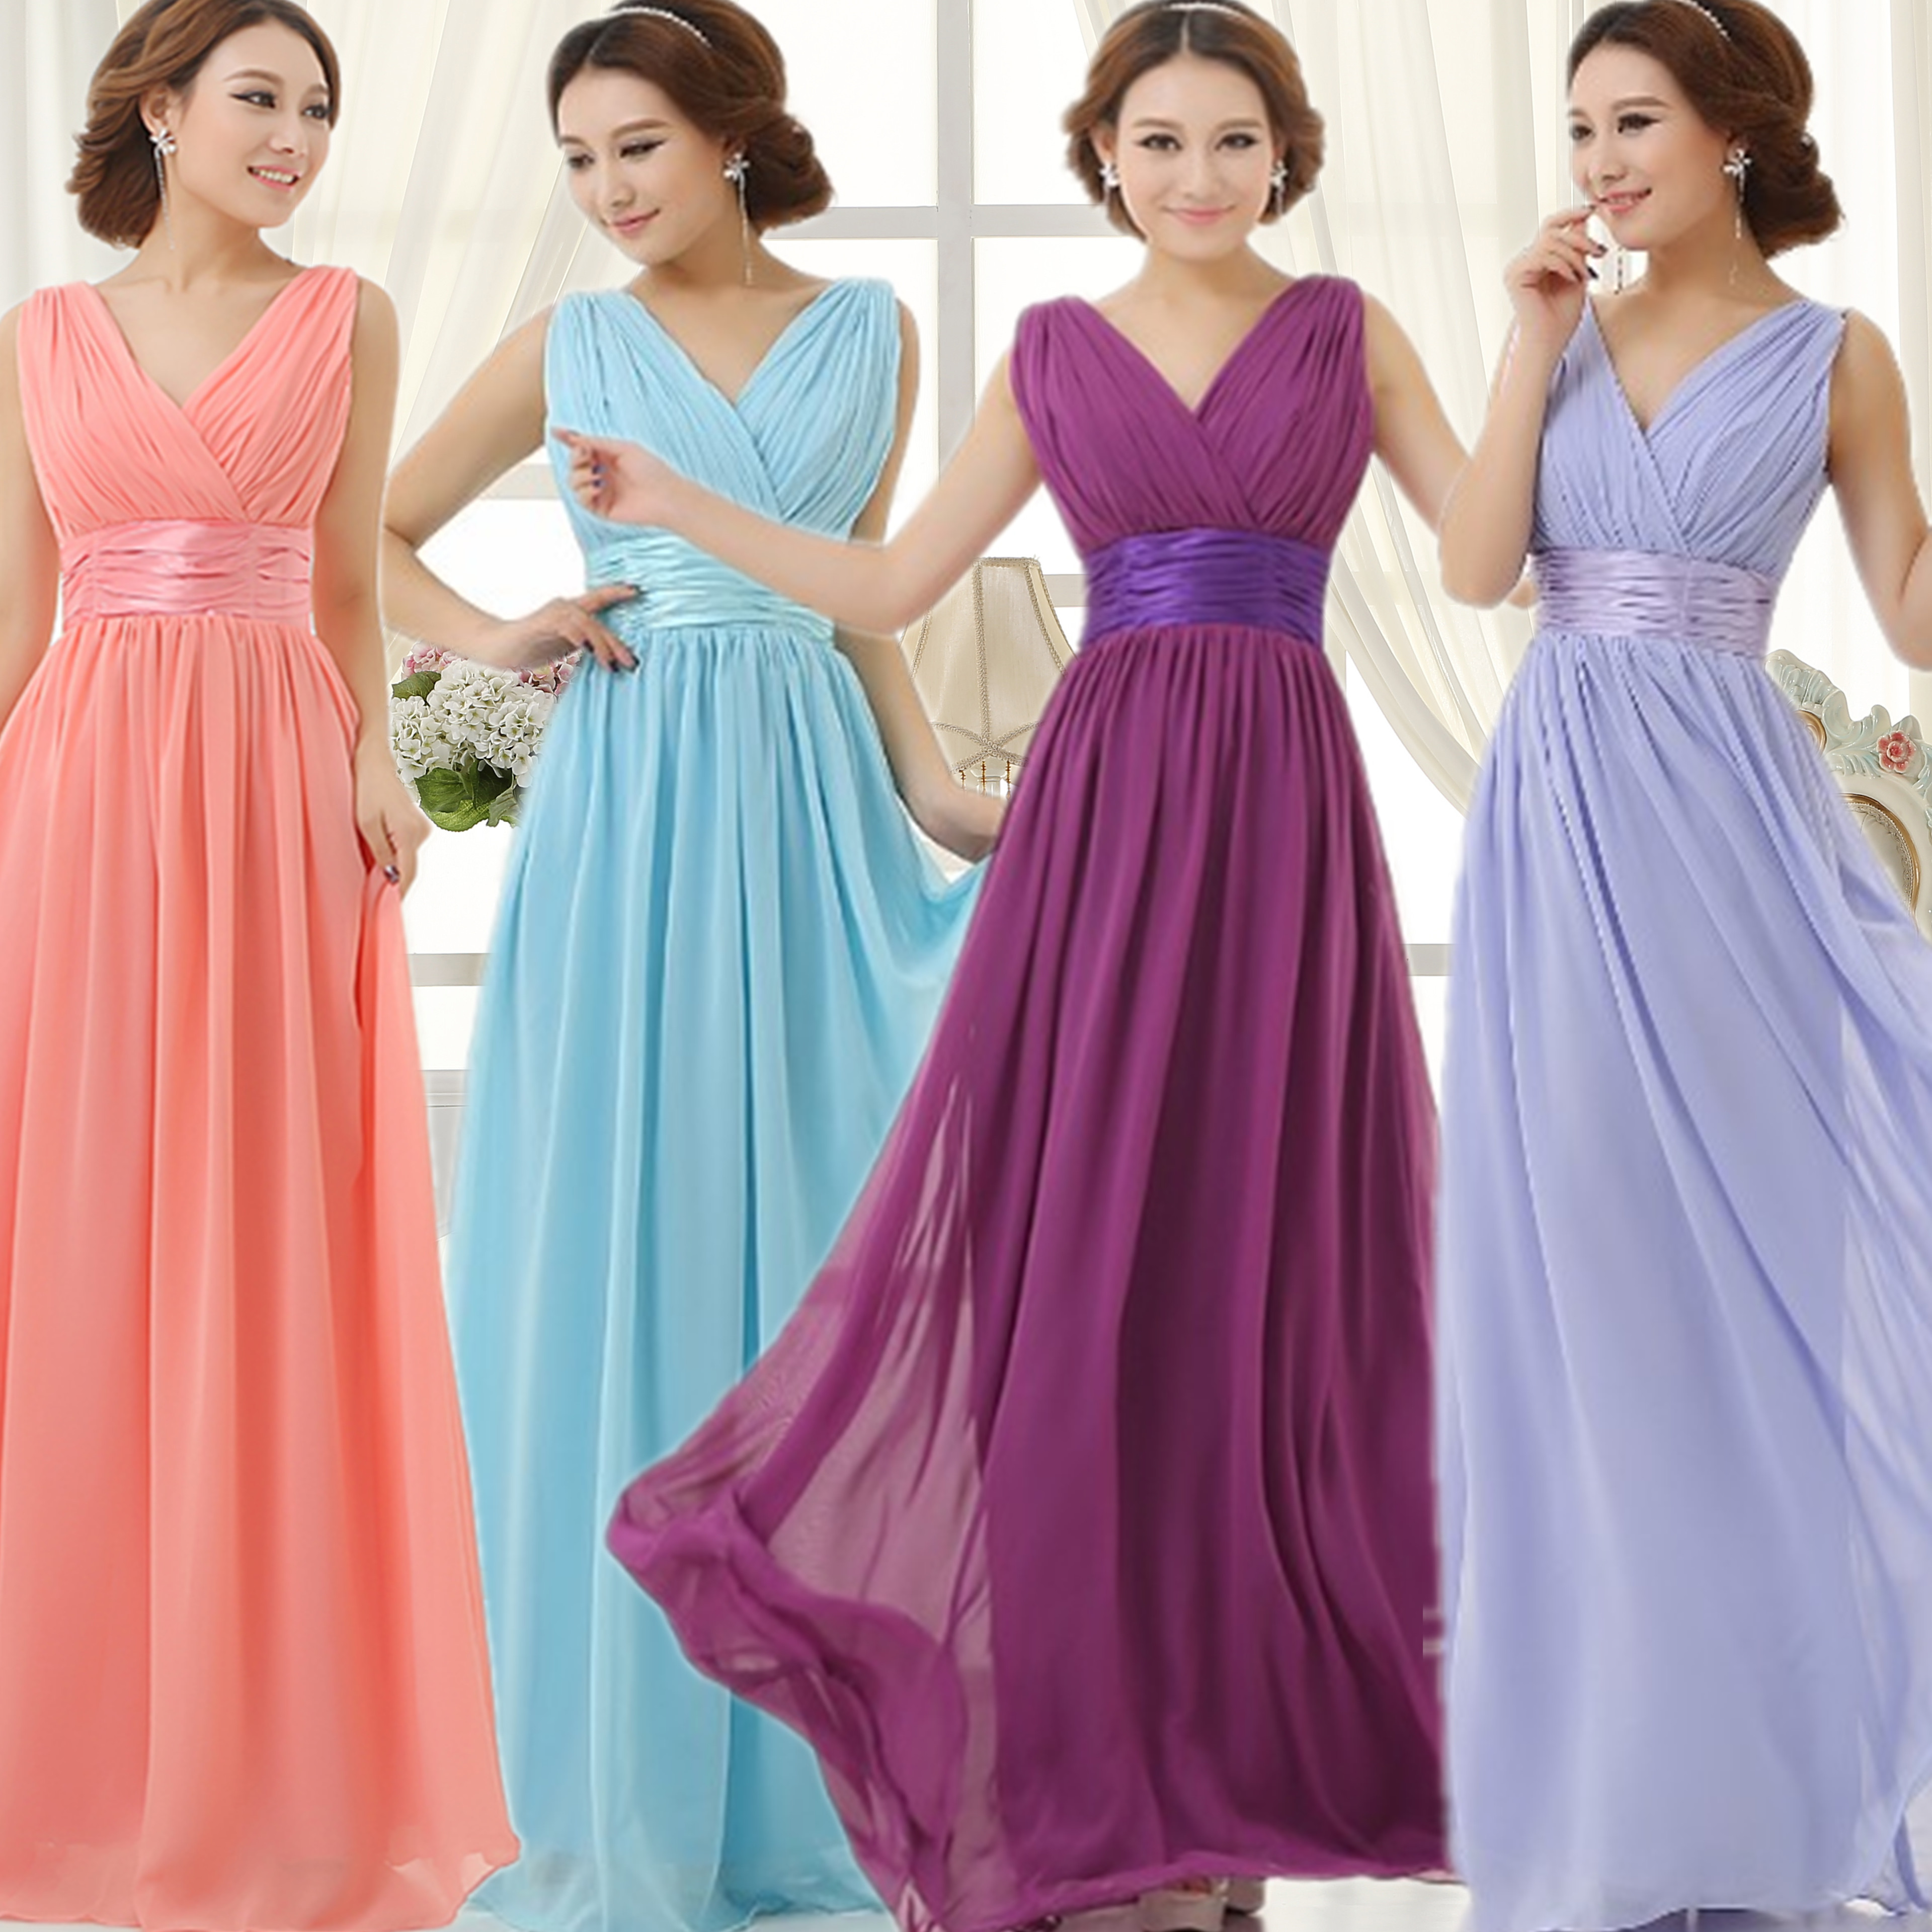 Purple And Pink Bridesmaid Dresses Choice Image - Braidsmaid Dress ...